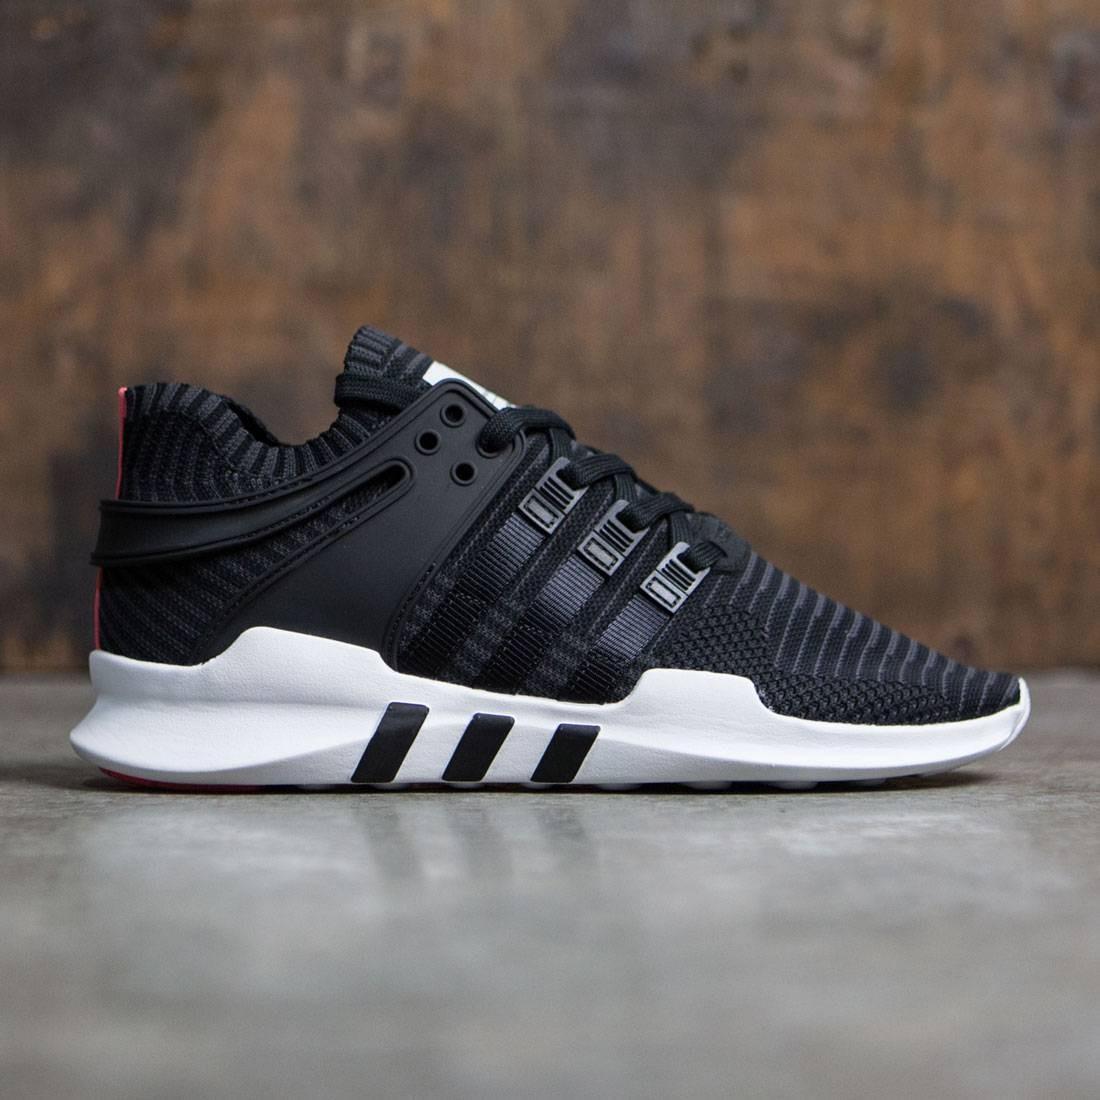 Adidas Eqt Walking Shoes